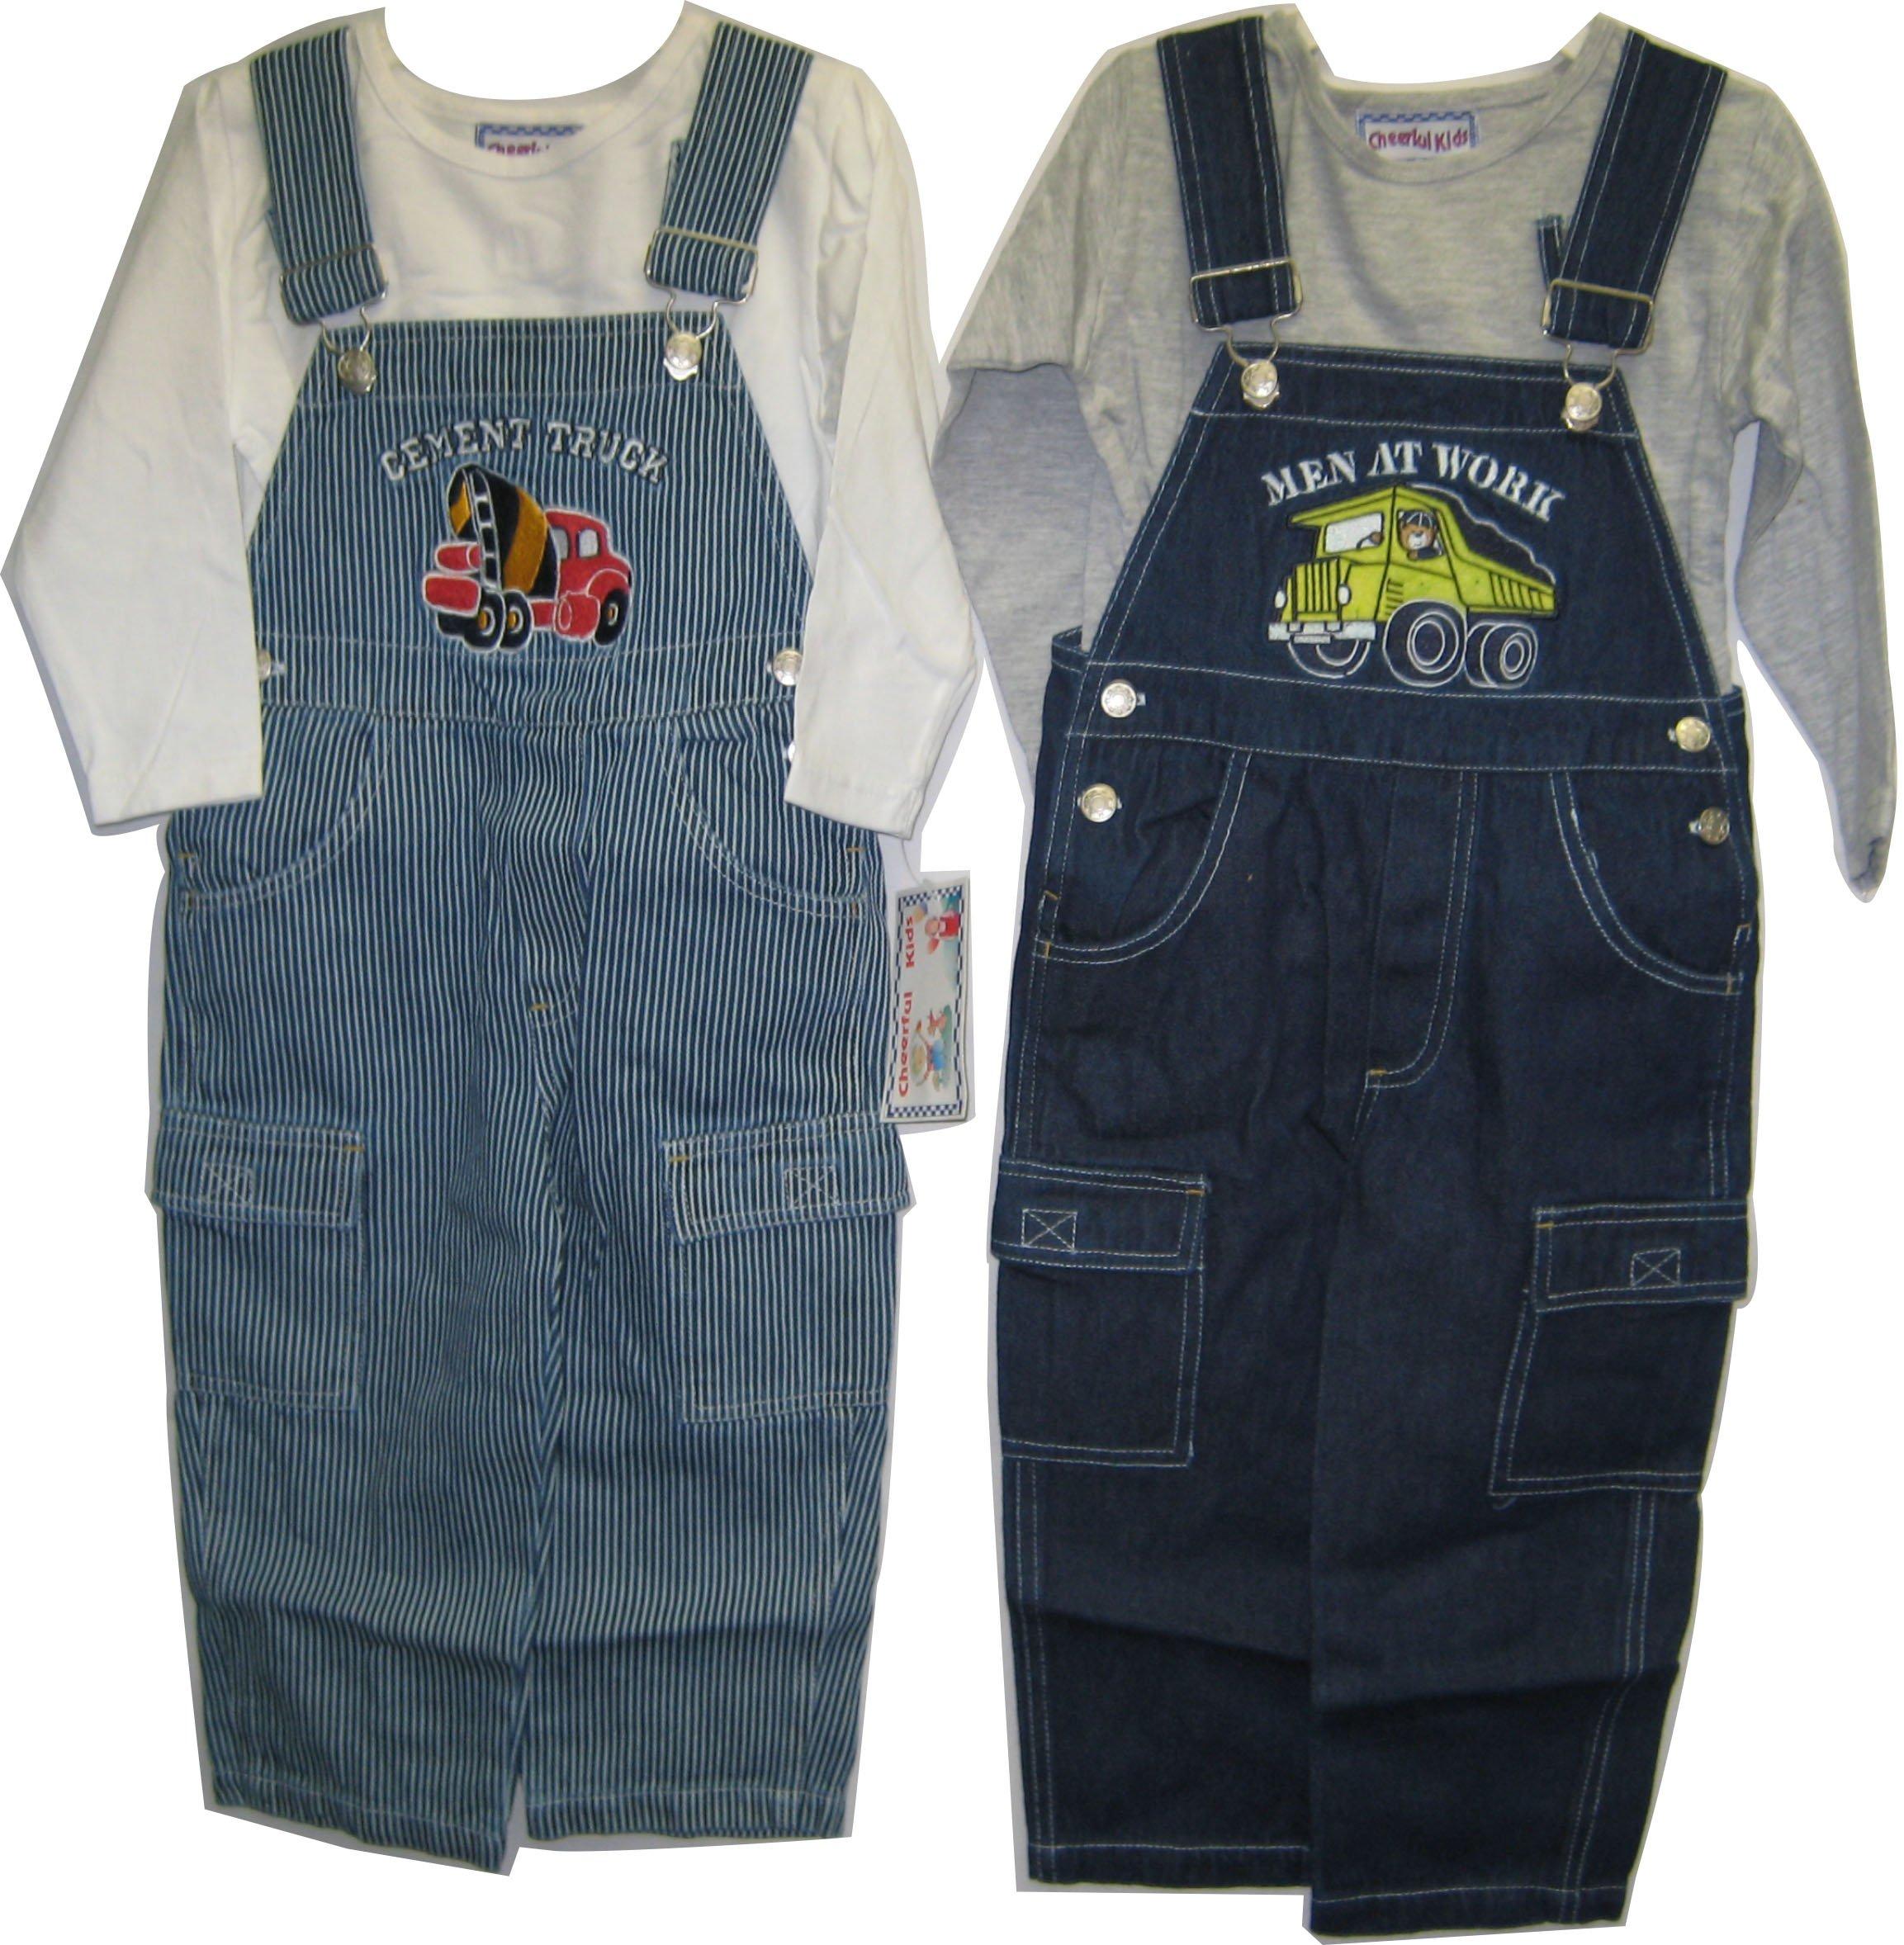 Boys Sizes 2T Indigo/Stripe Denim Embrodiery Overall 2-PC Set. 2 PACKS